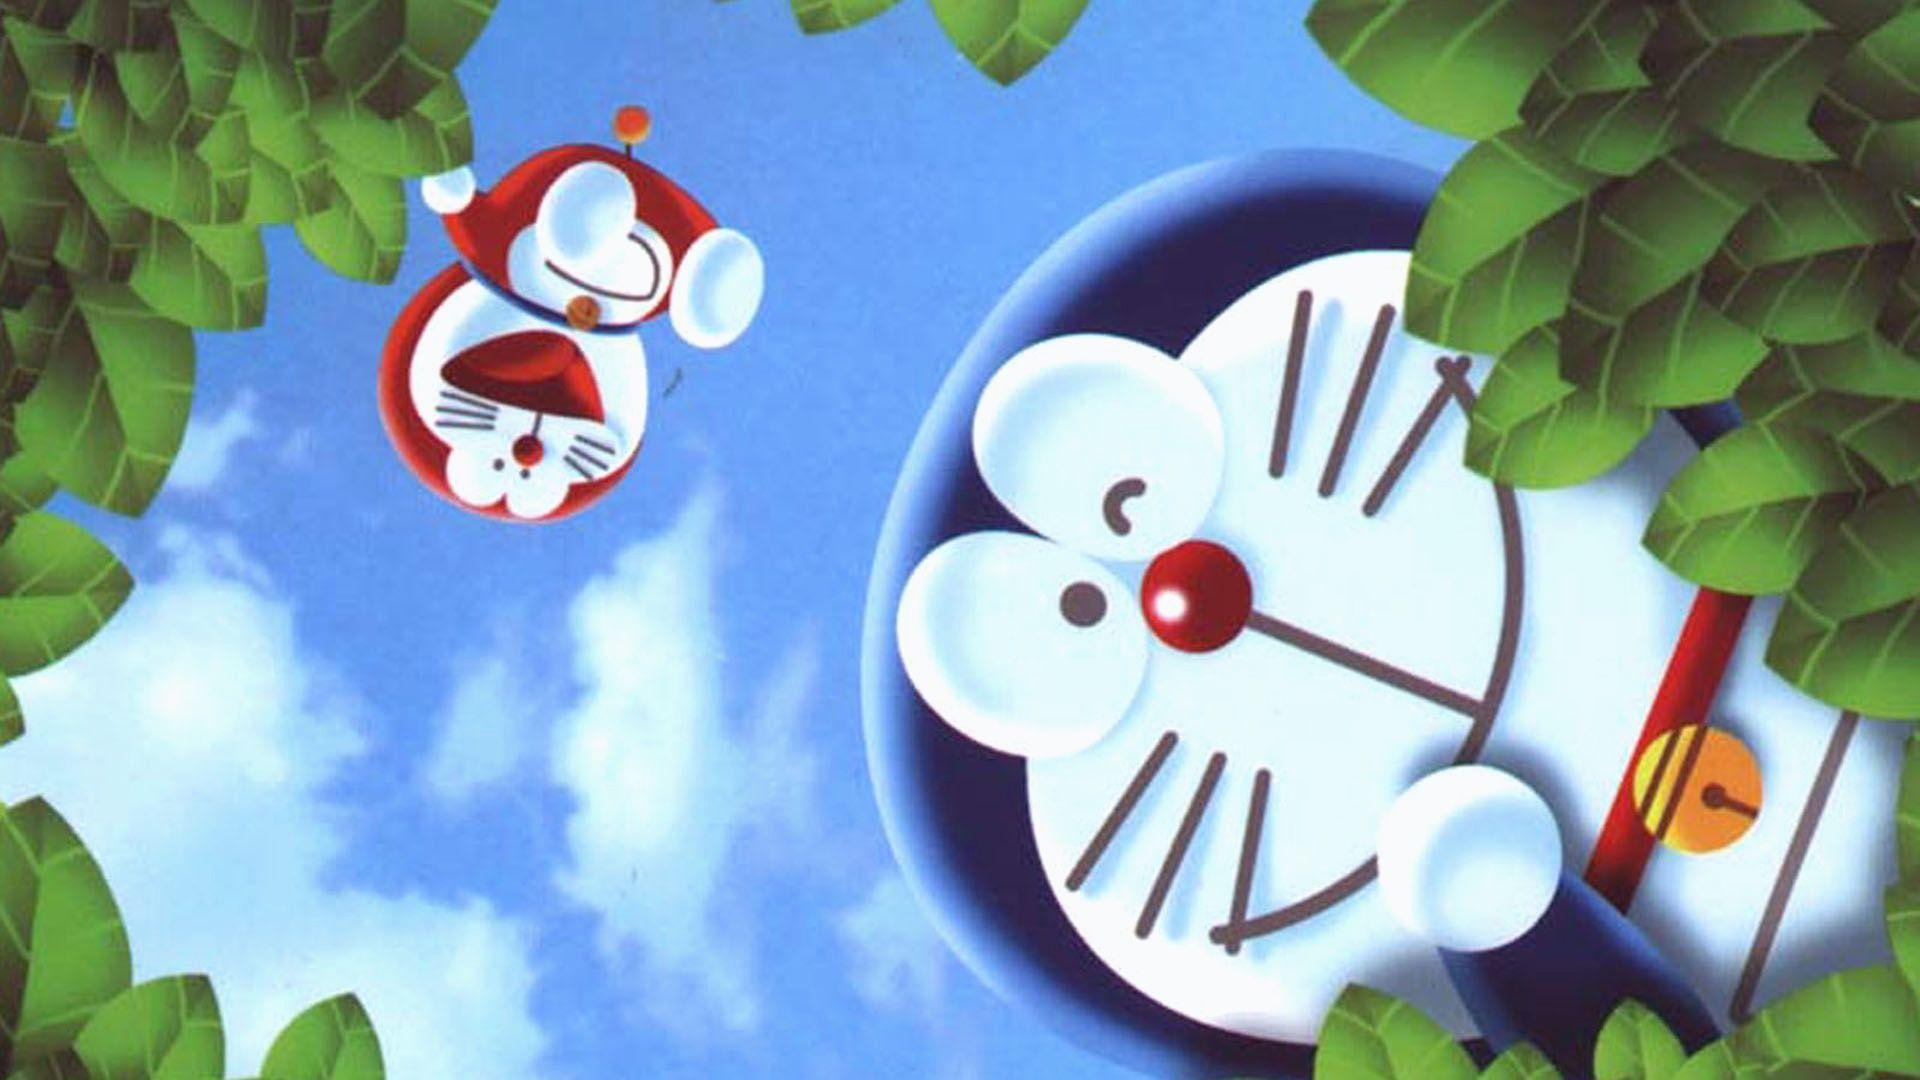 Download Doraemon 3d 5122 Hd Full Size Wallpaper